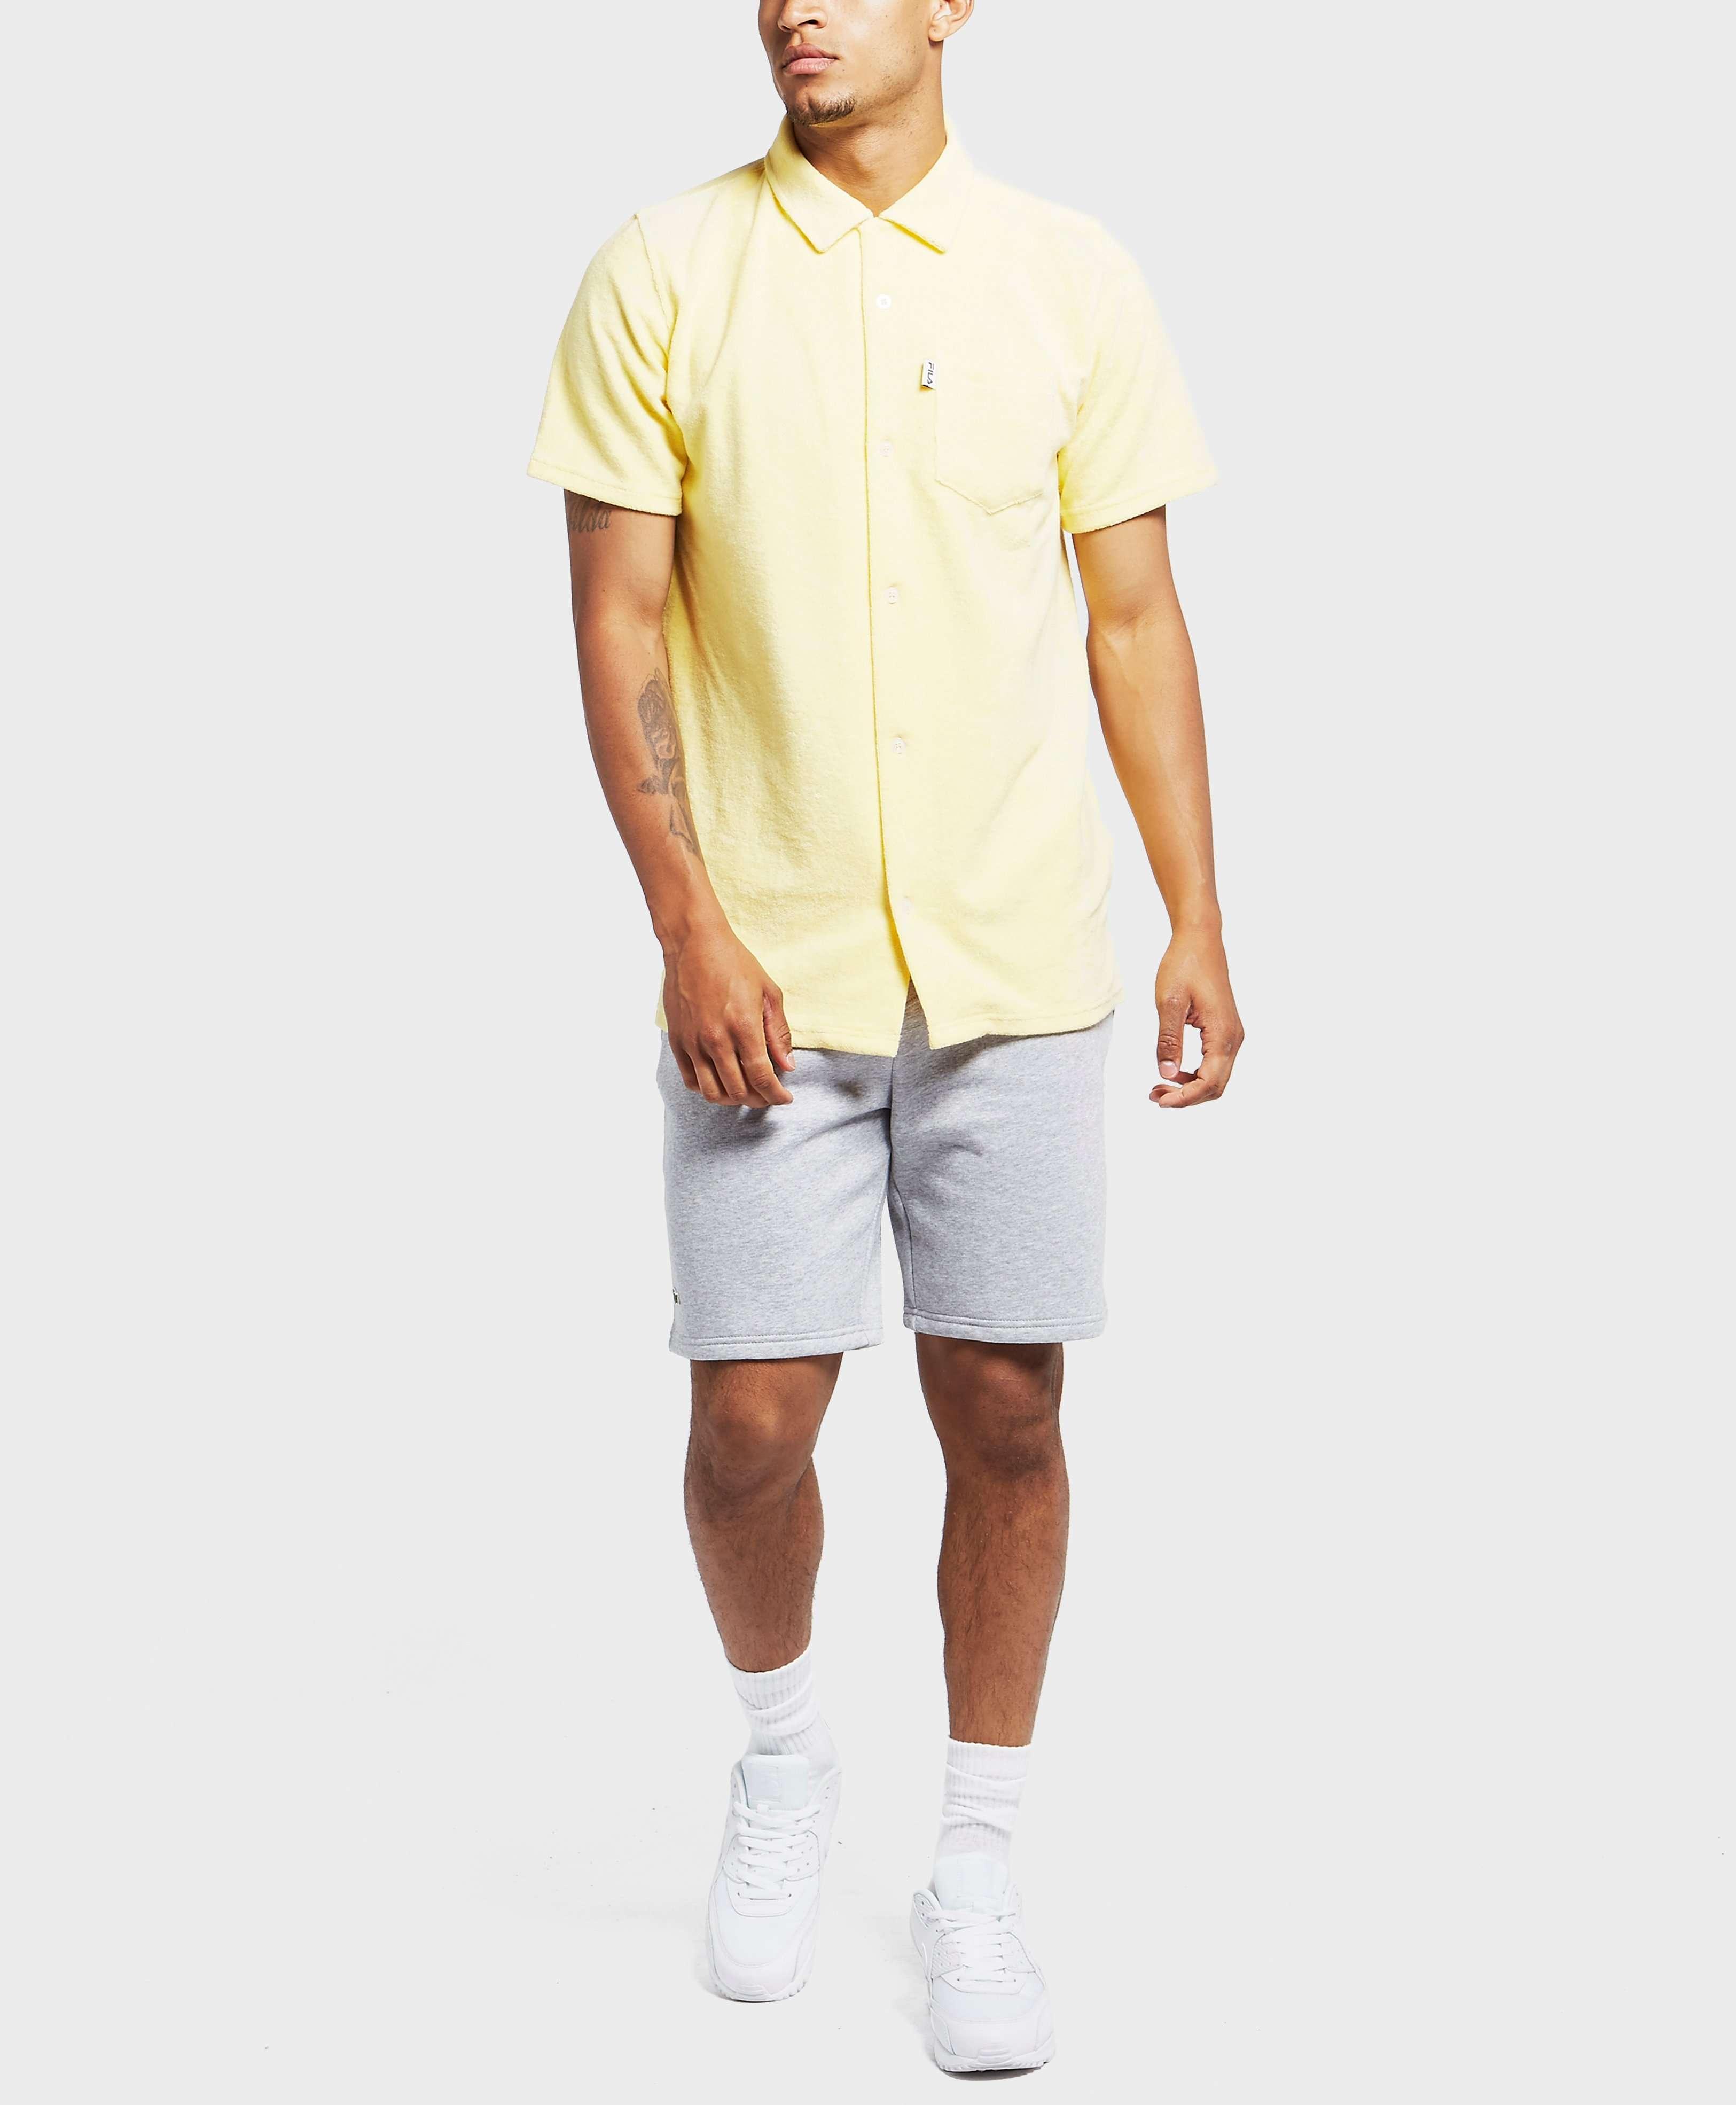 Fila Luna Short Sleeve Shirt - Exclusive